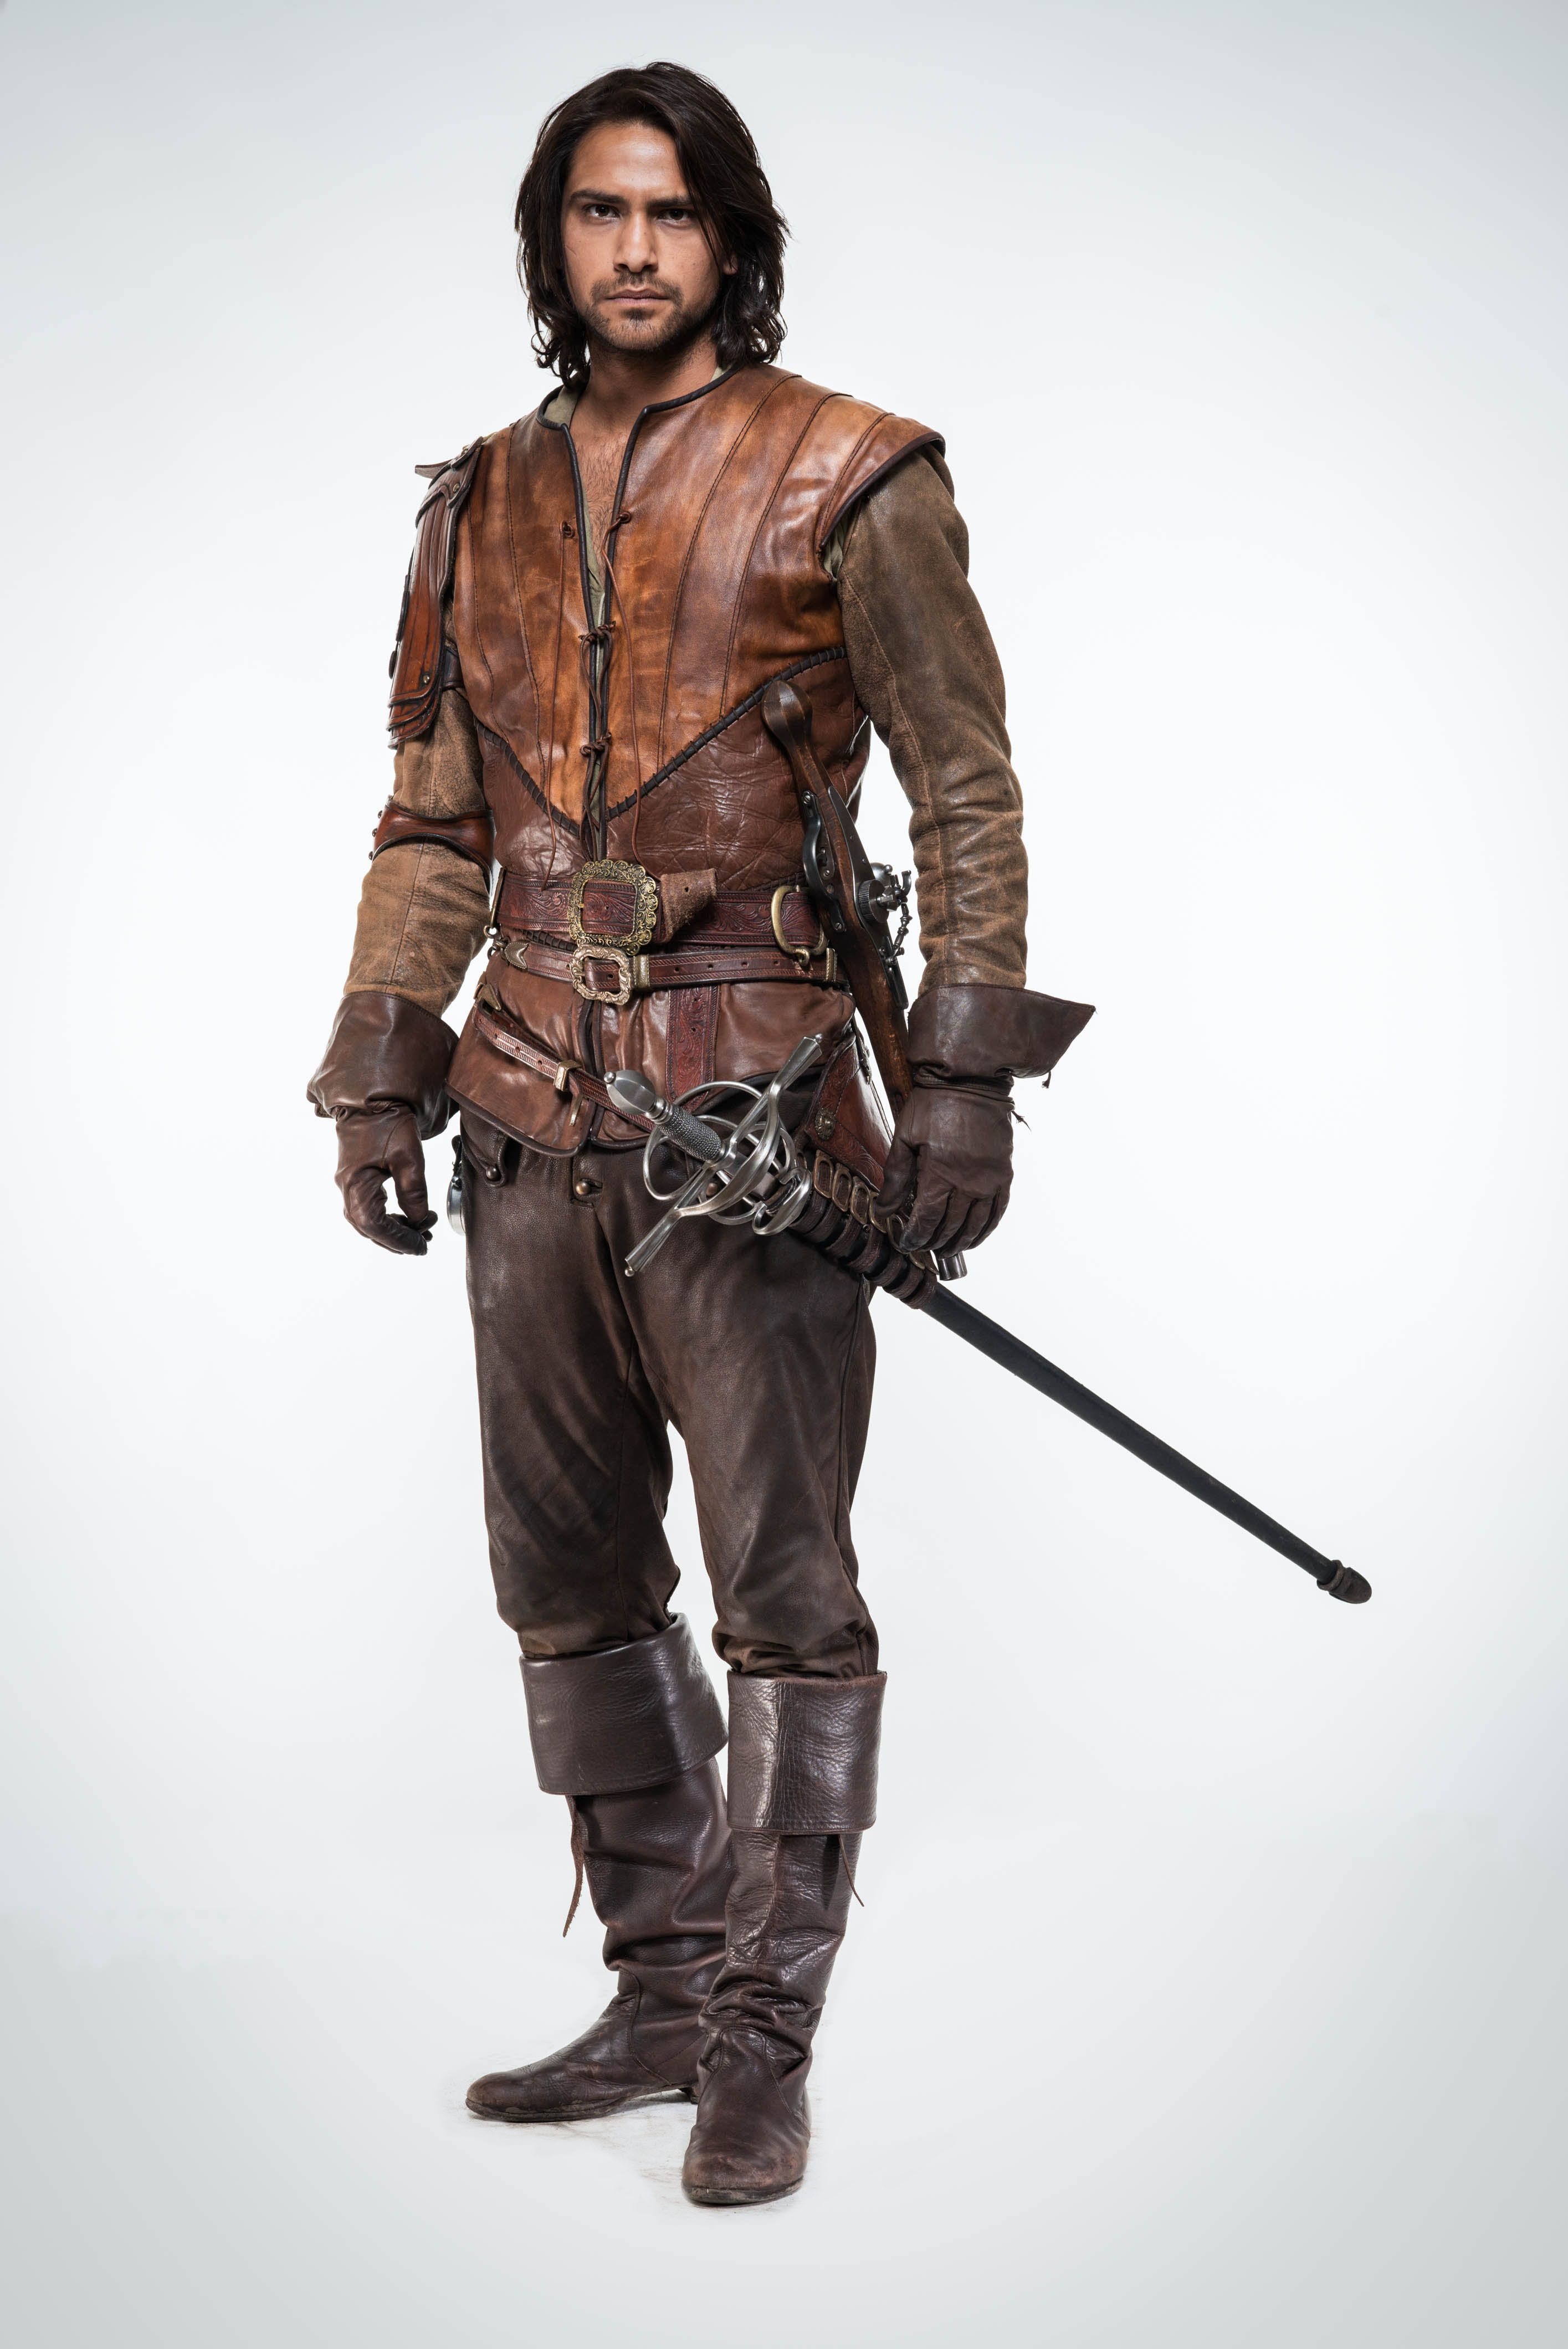 The-Musketeers-Season-2-Cast-Photo-D-Artagnan-the-musketeers-bbc-37863852-2830-4240.jpg (2830×4240)